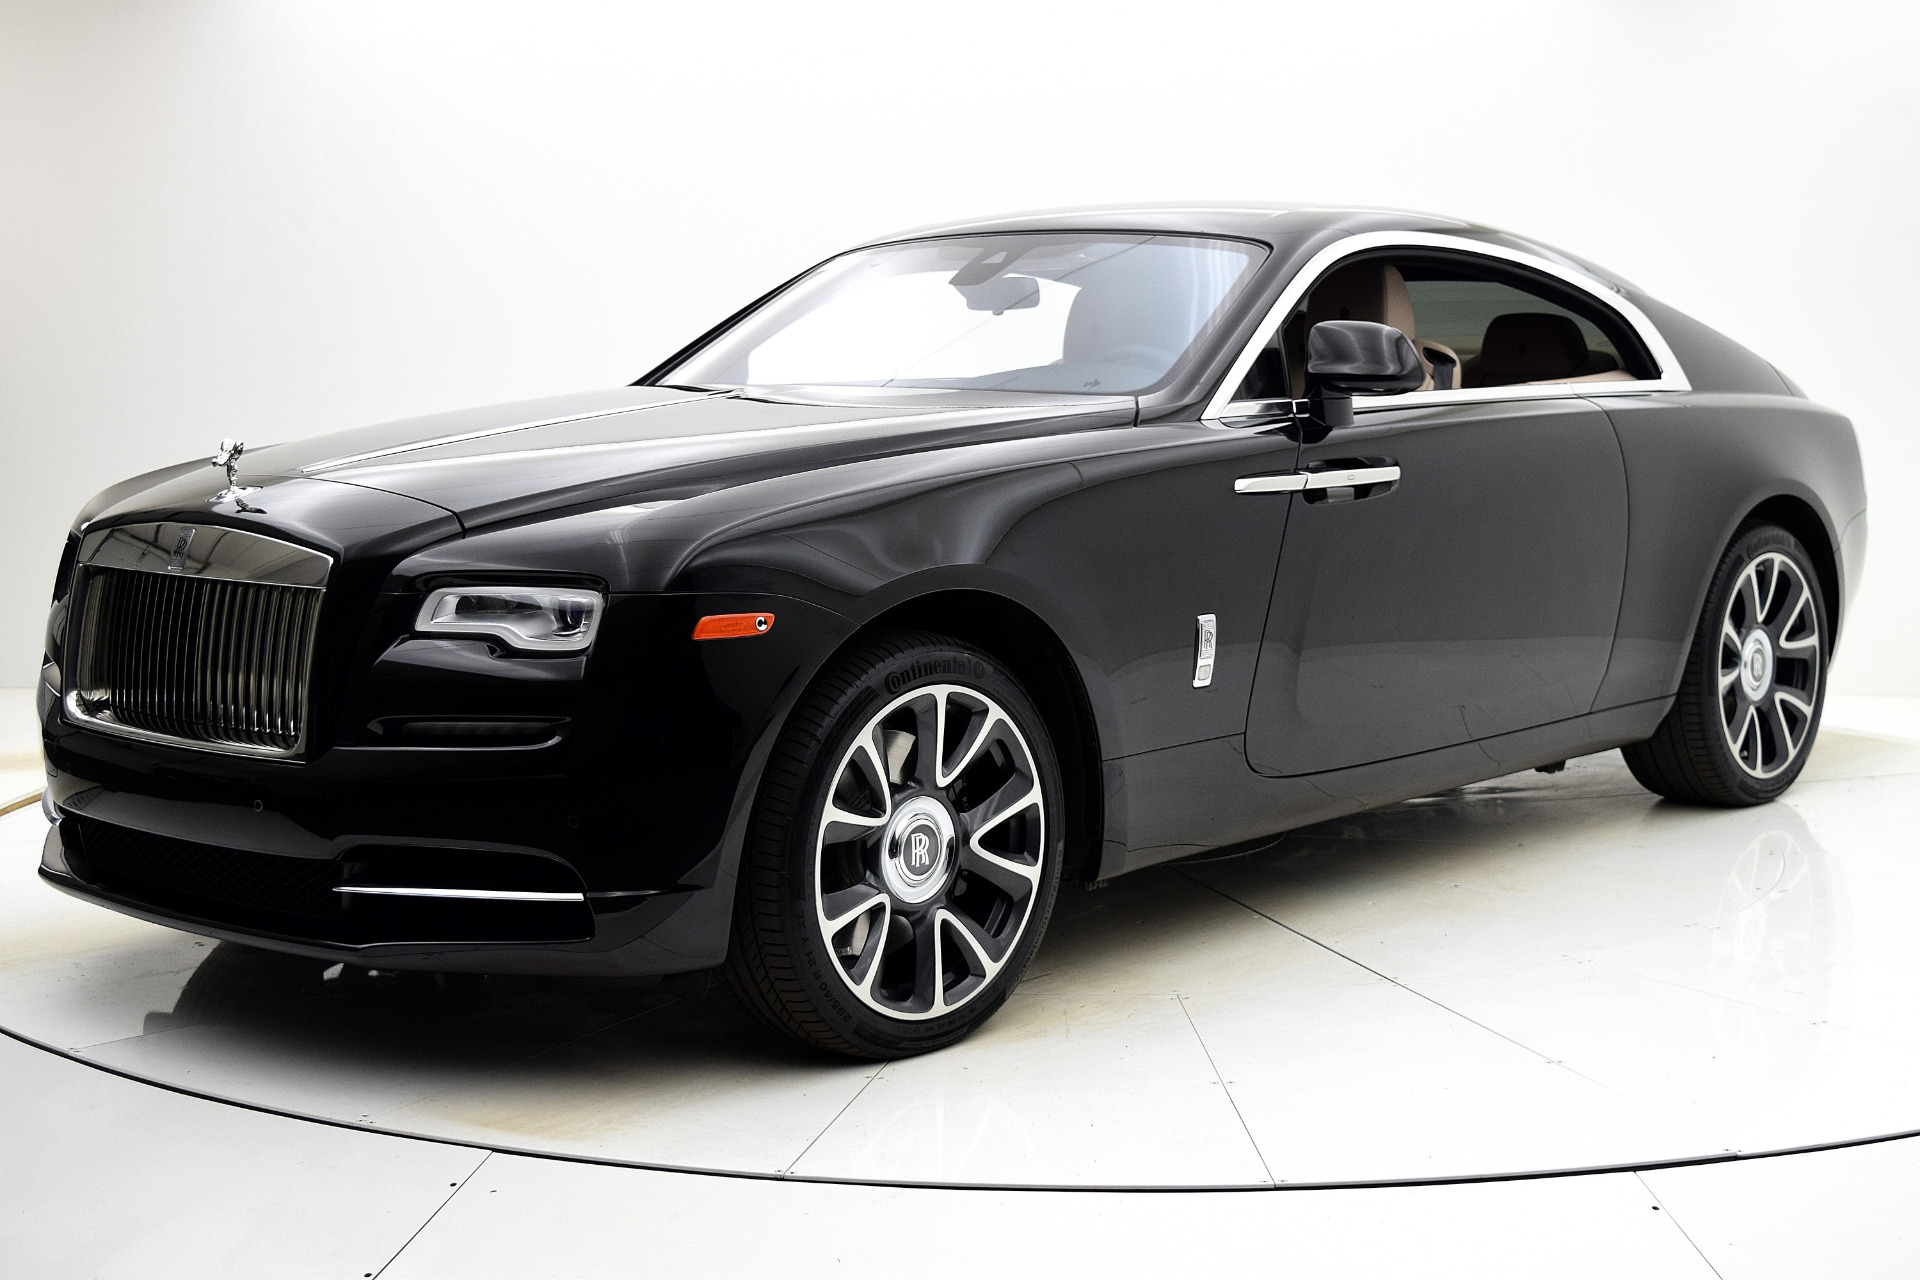 Used 2017 Rolls-Royce Wraith for sale $229,880 at Bentley Palmyra N.J. in Palmyra NJ 08065 2